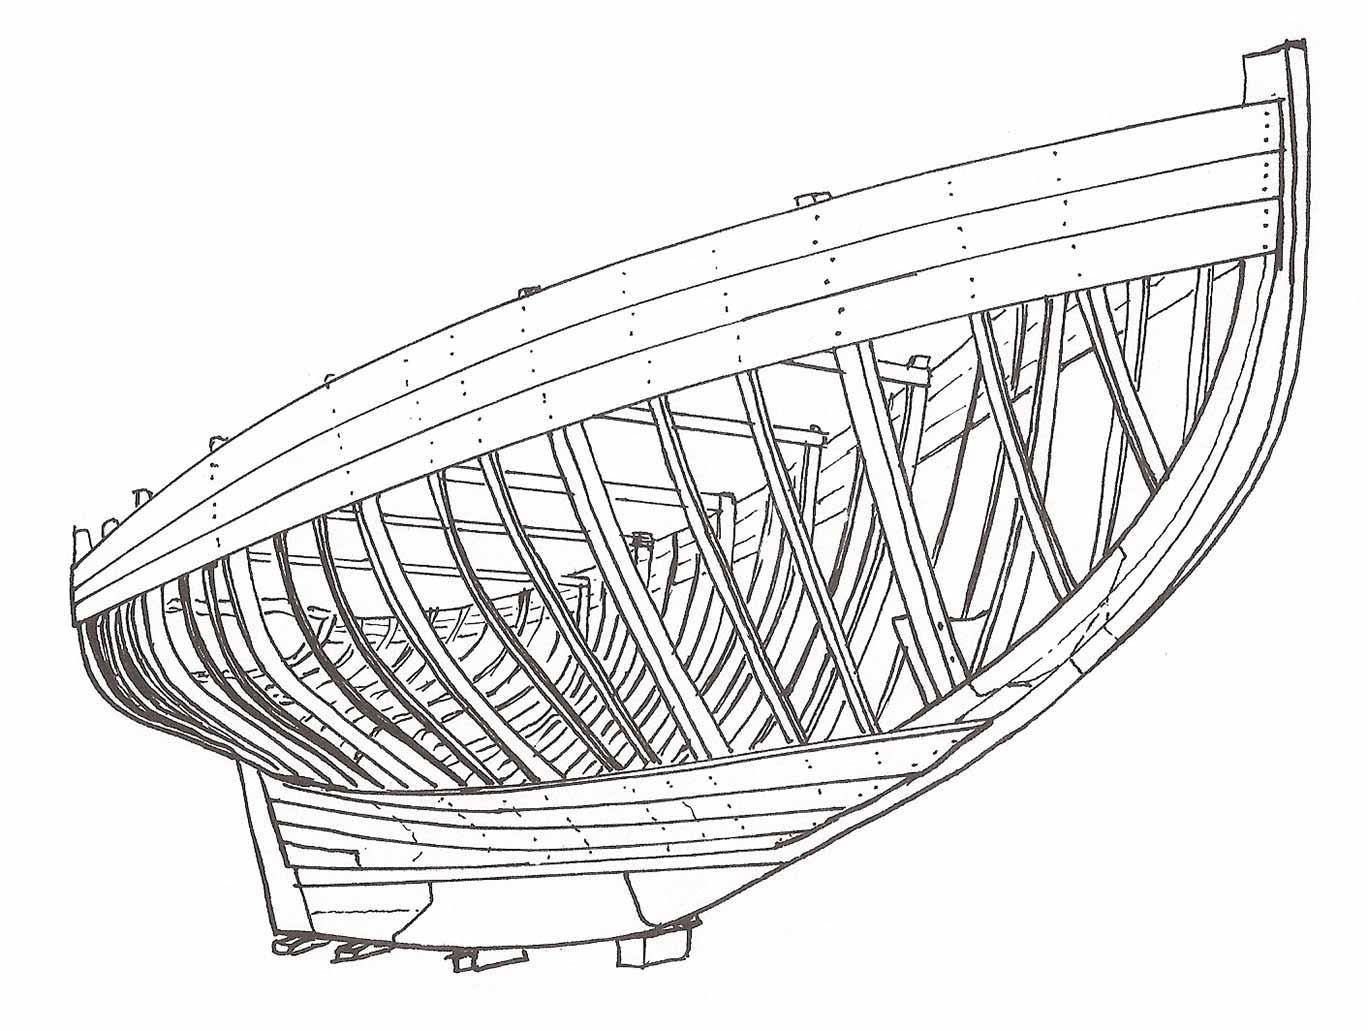 boat bg wiring diagram schematic diagram Boat Instrument Panel Wiring Diagrams boat bg wiring diagram all wiring diagram marine accessory wiring diagram boat bg wiring diagram auto